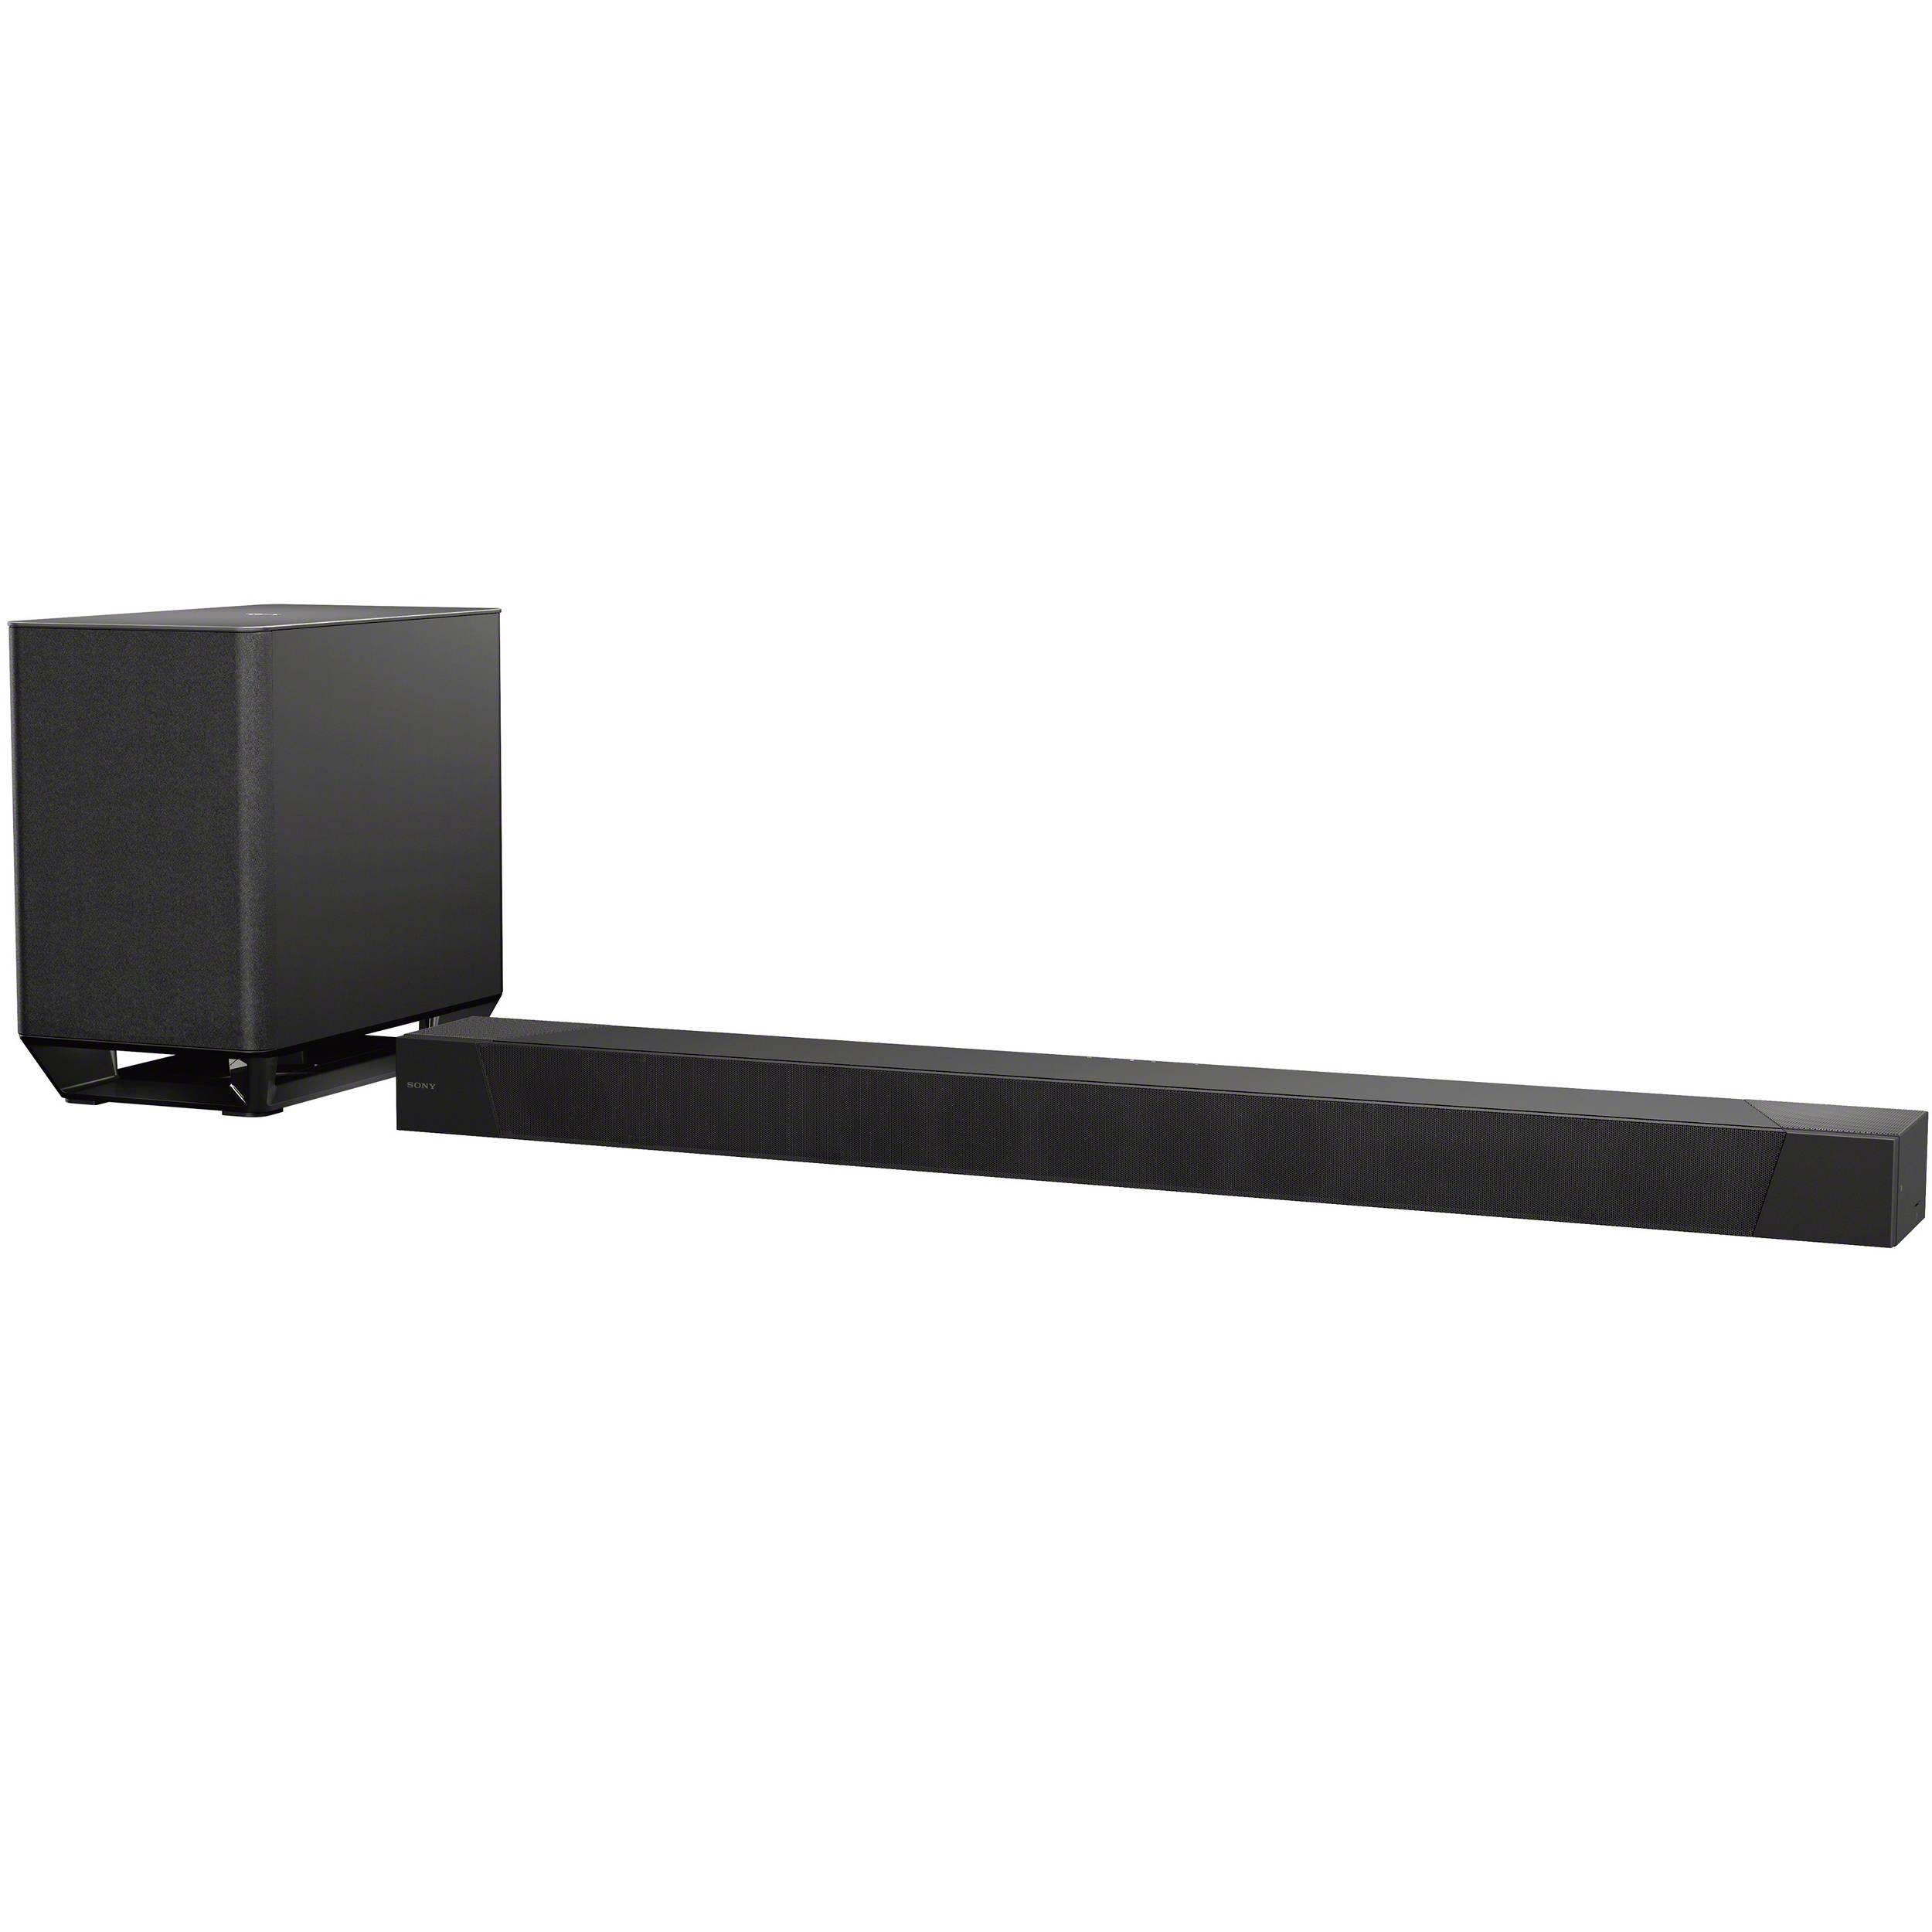 SONY 索尼 HT-ST5000 單件式 高音質 環繞 無線 藍芽 家庭劇院 | 金曲音響